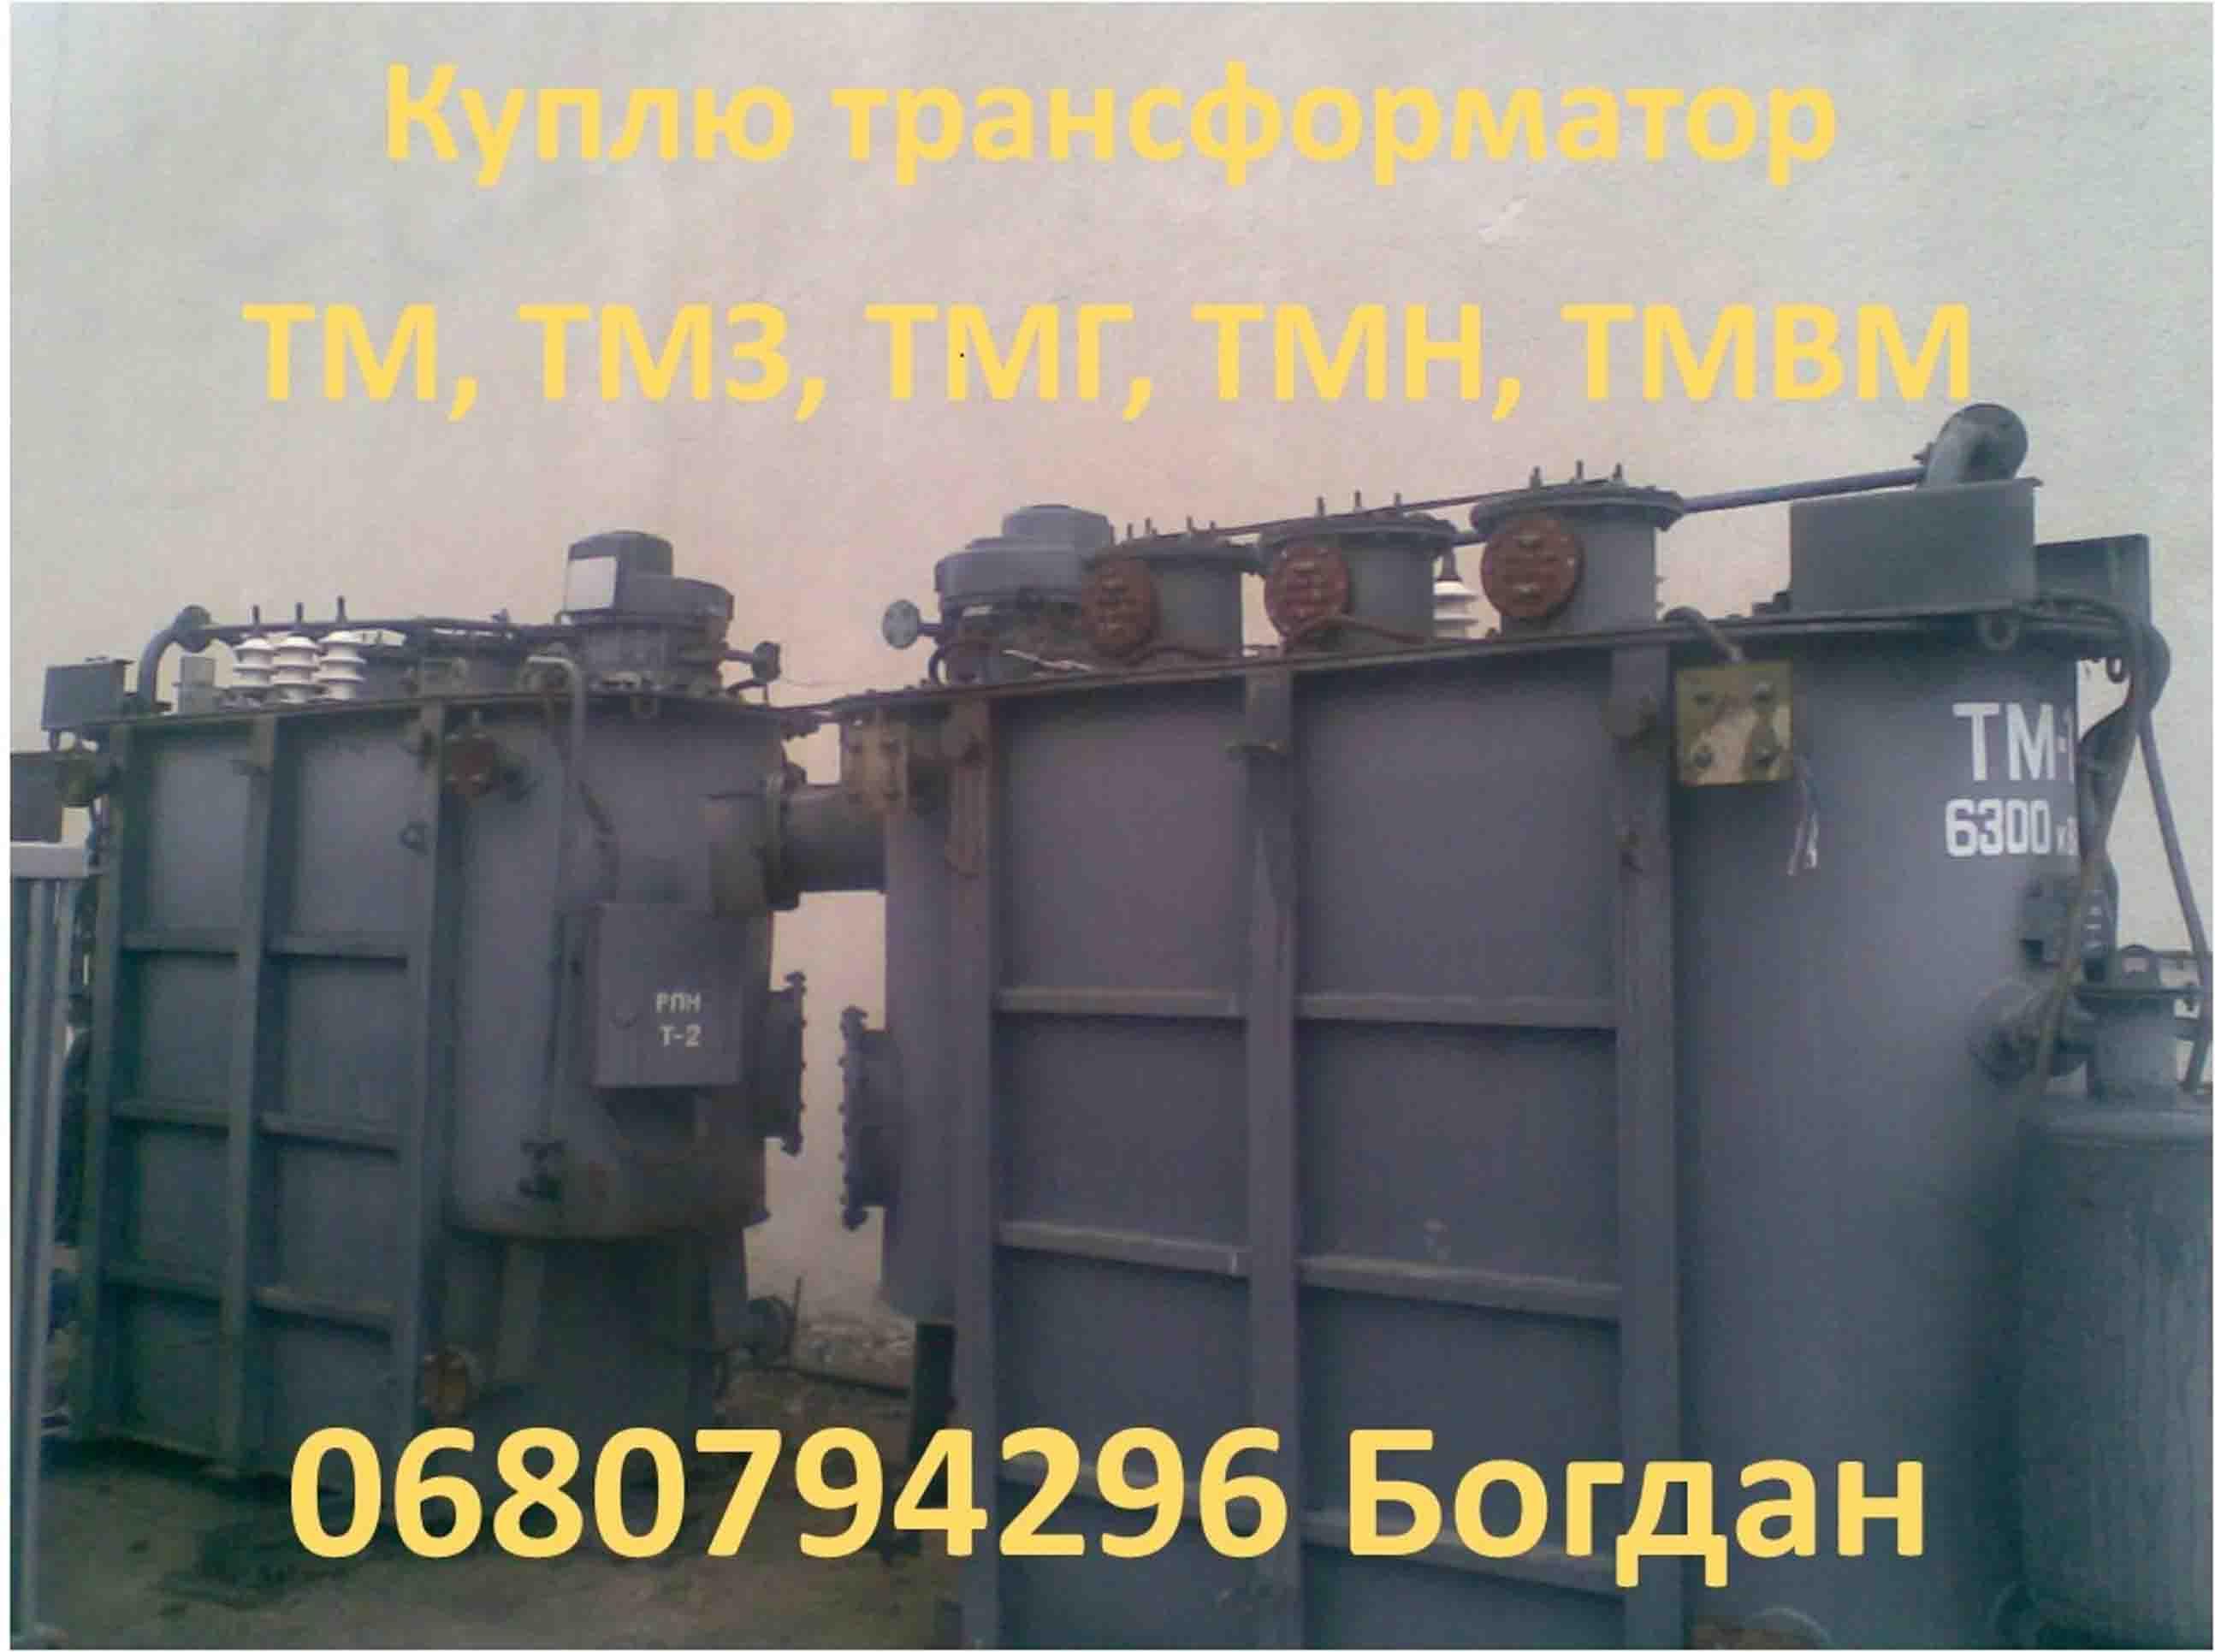 Покупаем силовые трансформаторы  ТМ, ТМН, ТМЗ, ТМГ, ТДН